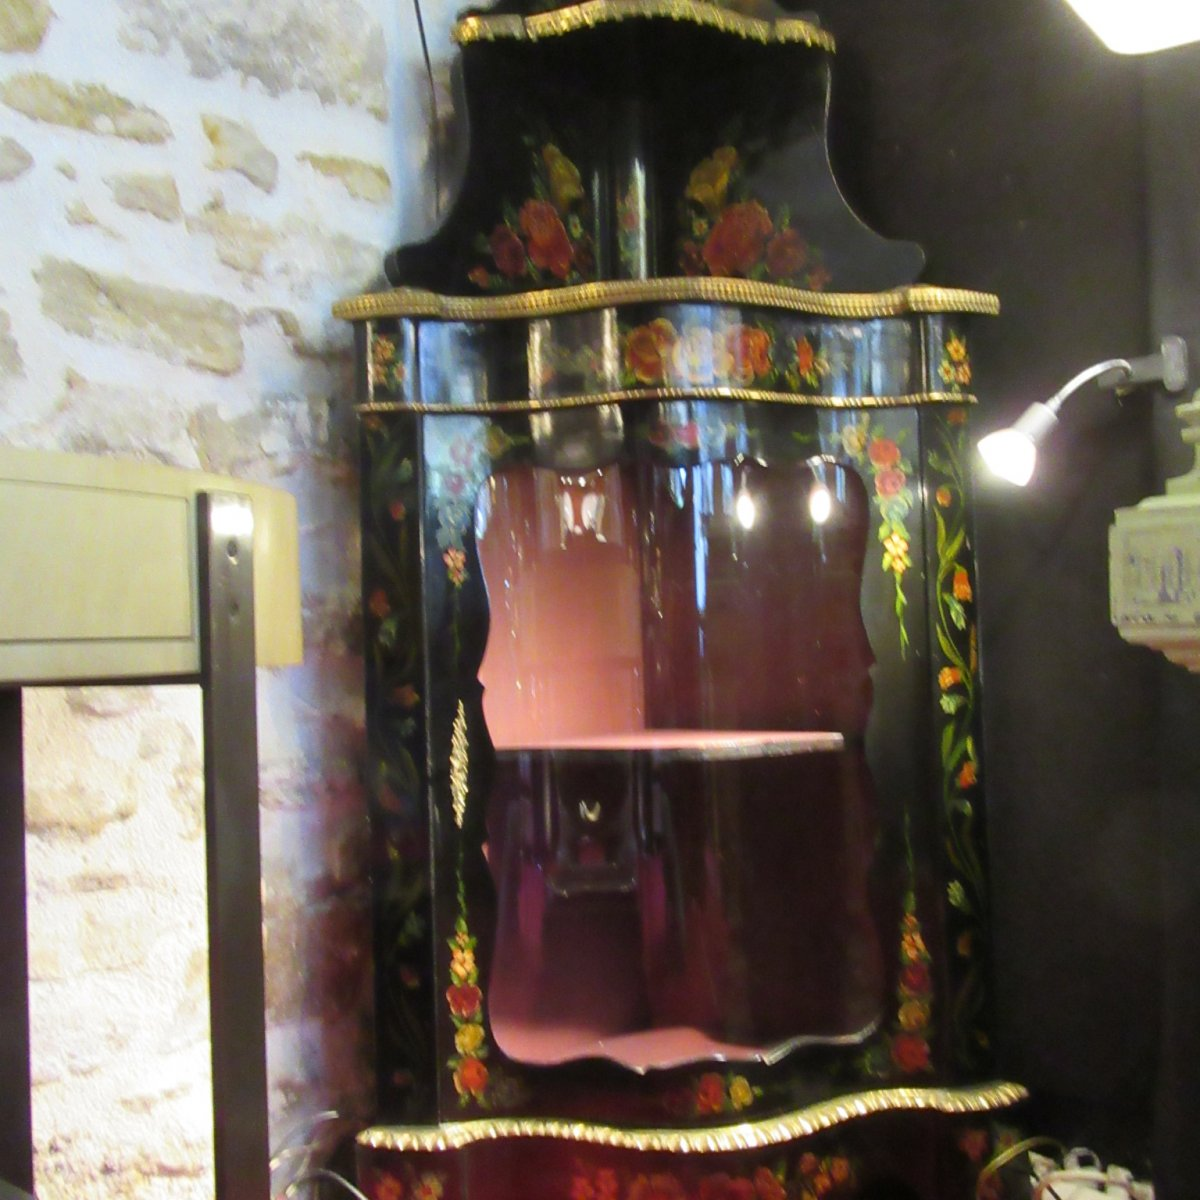 Encoignure Epoque Napoléon III En Poirier Noirci , Décor Floral Et Bronze